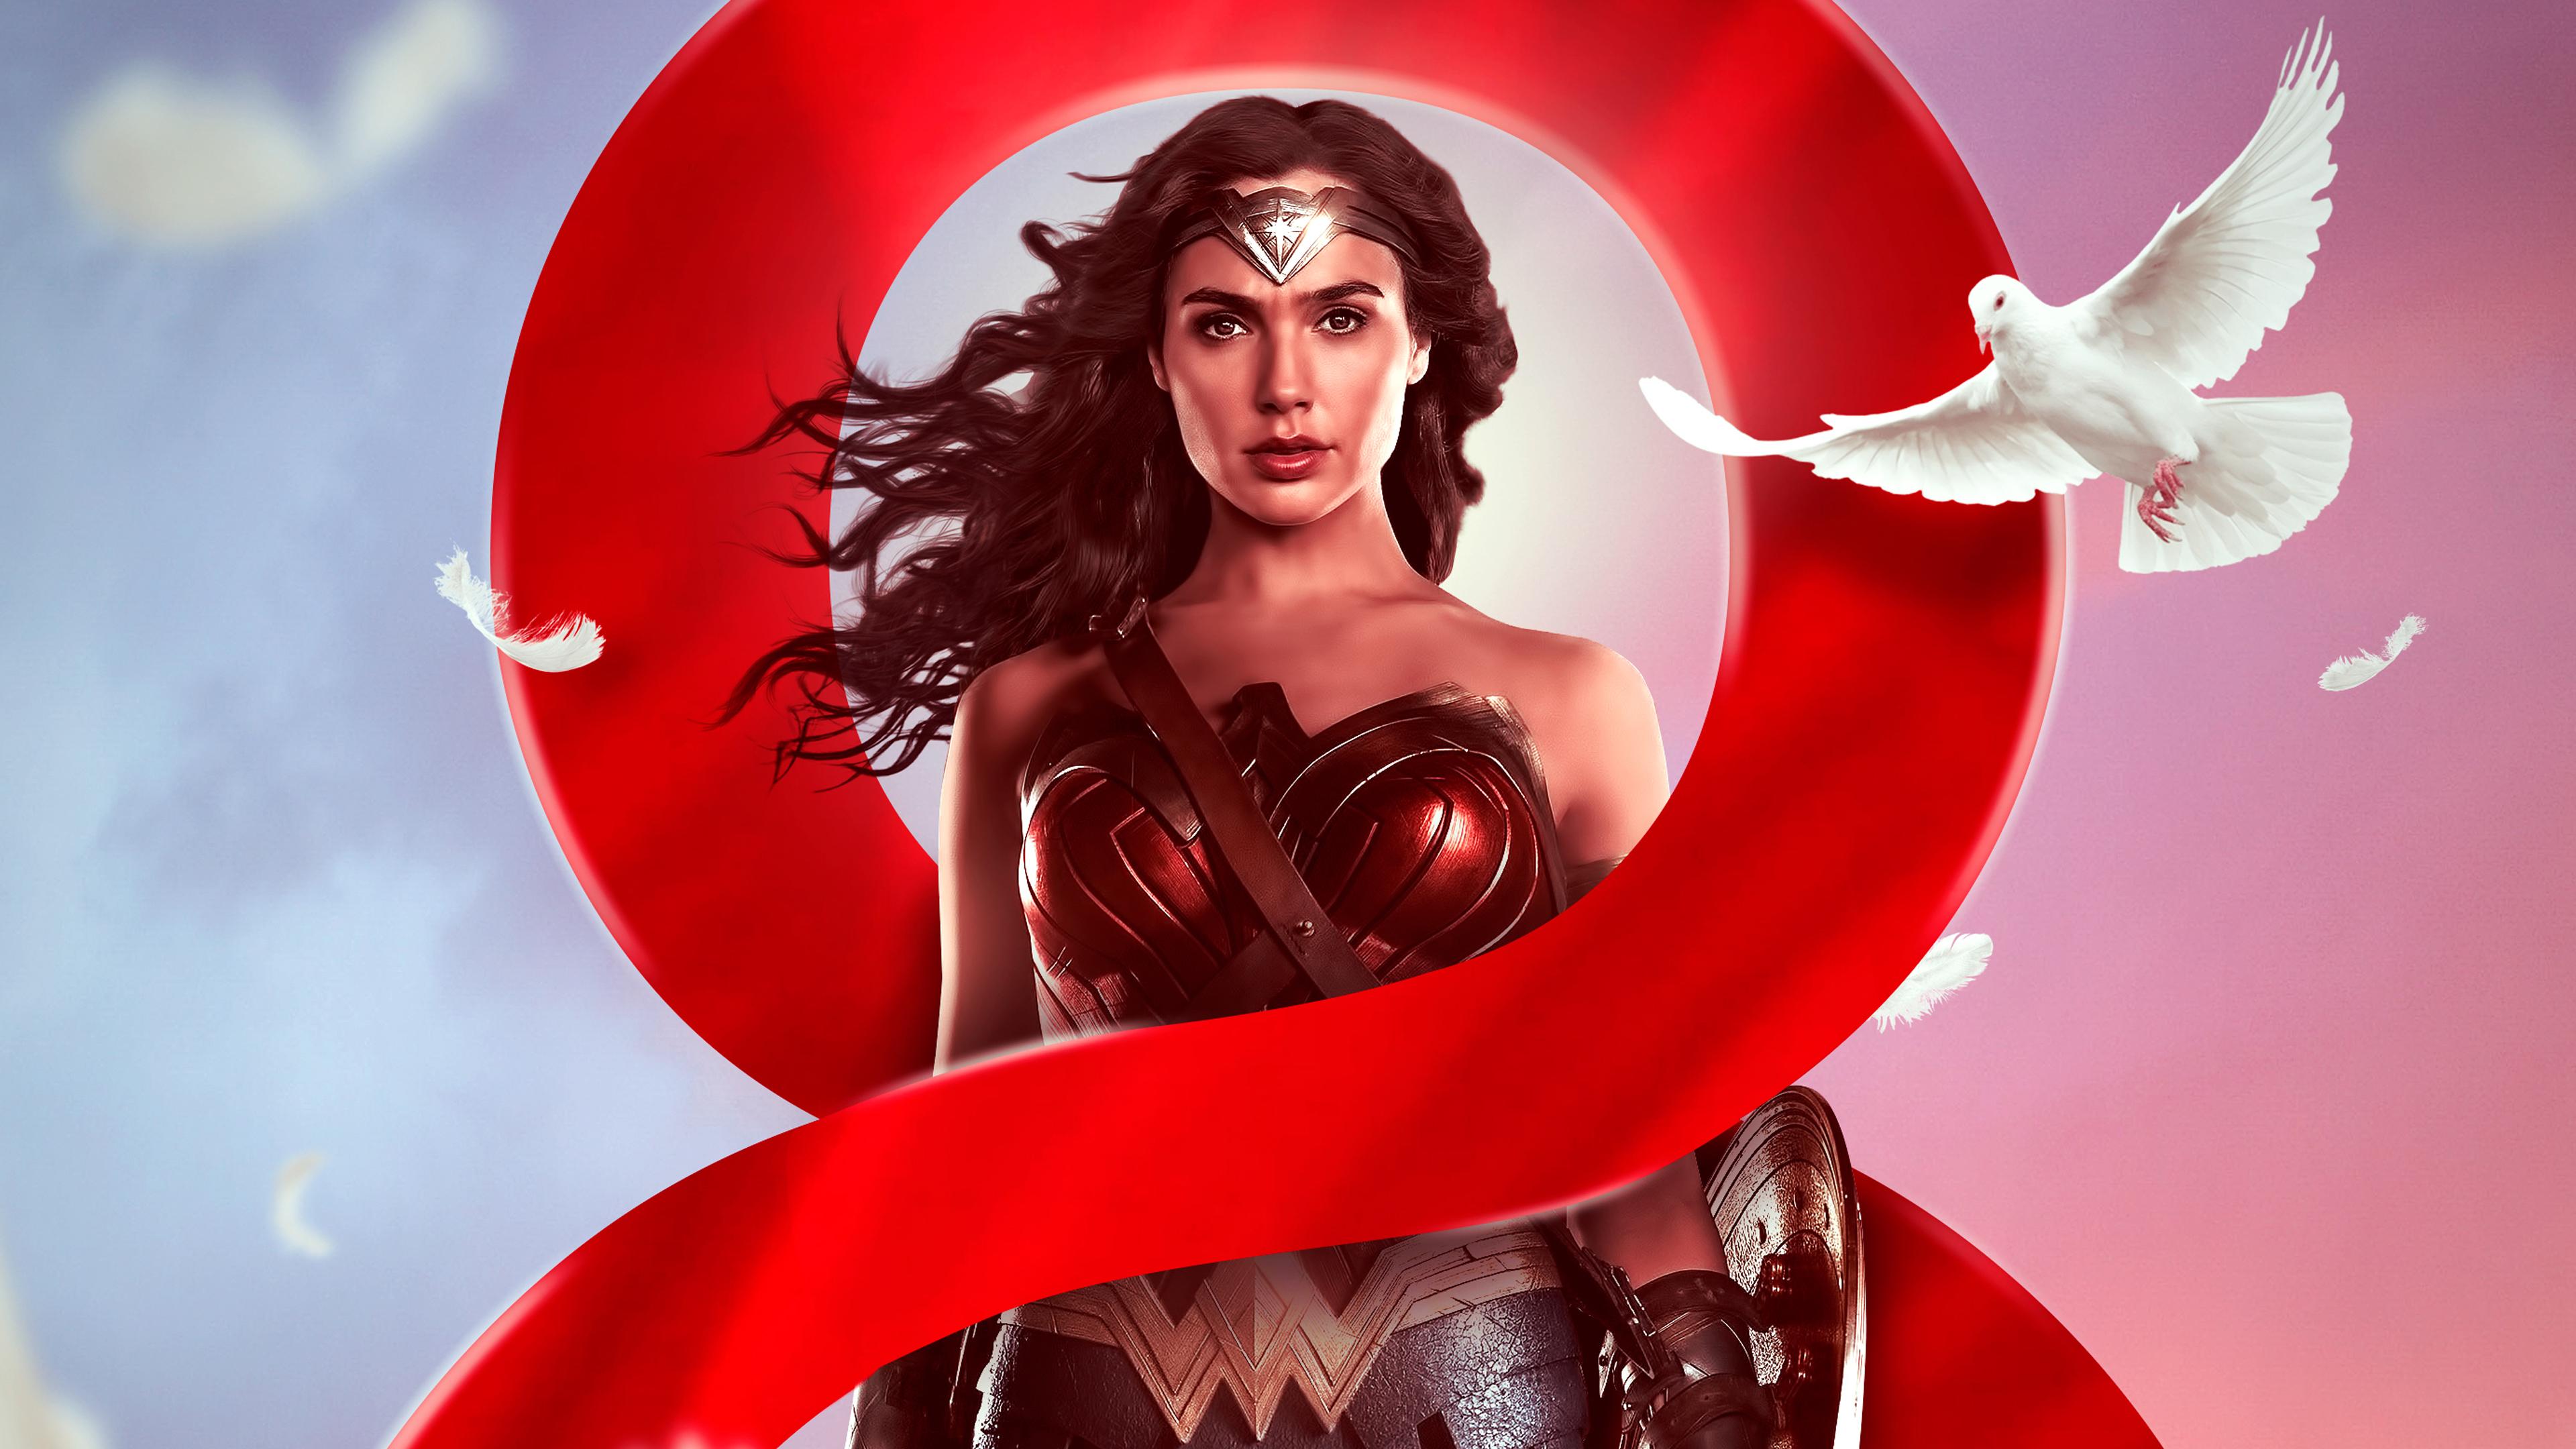 wonder woman poster design 4k 1536524112 - Wonder Woman Poster Design 4k - wonder woman wallpapers, superheroes wallpapers, poster wallpapers, hd-wallpapers, behance wallpapers, 4k-wallpapers